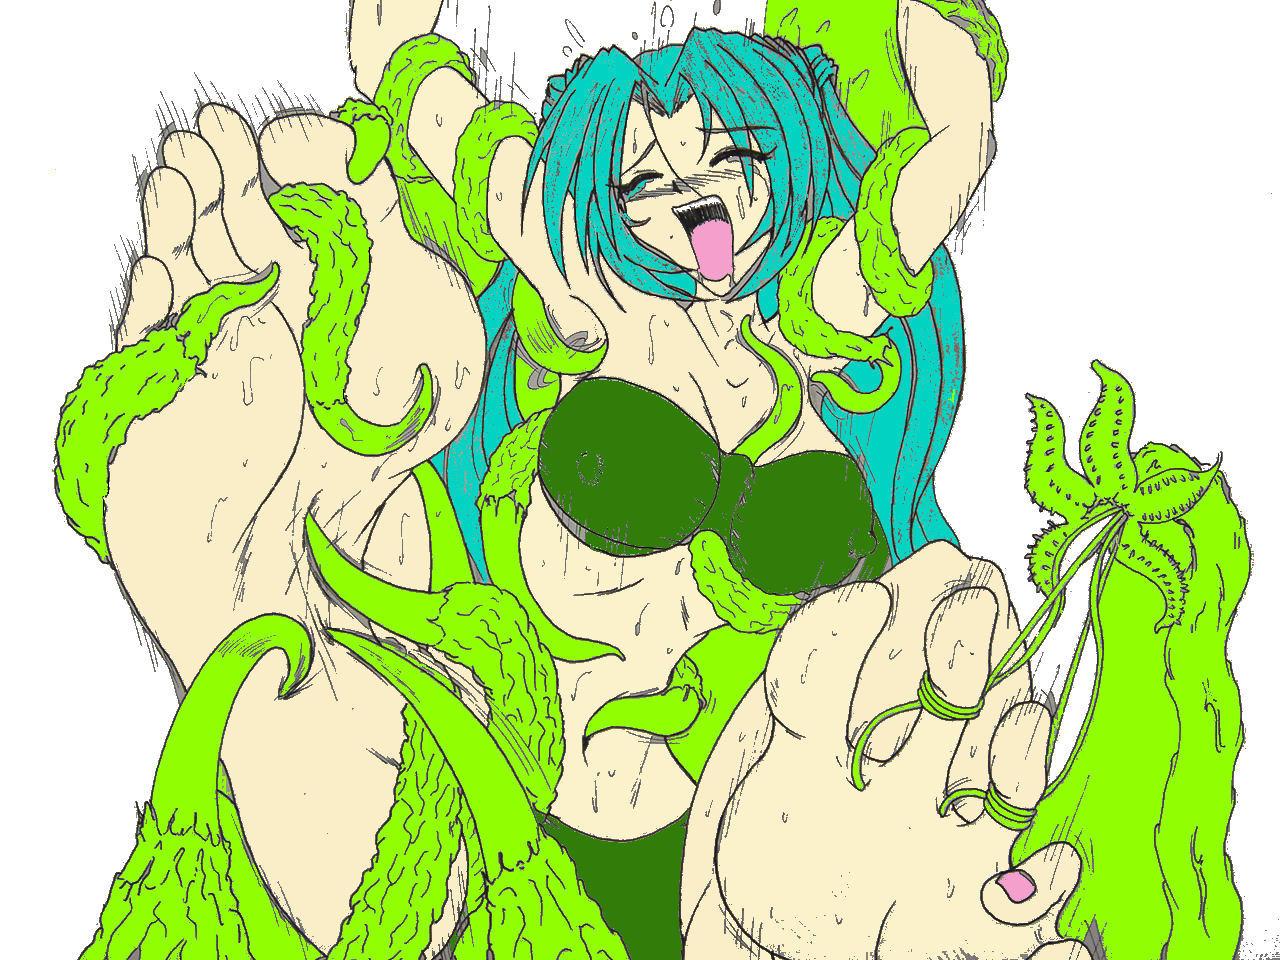 Anime ticklish dick nude scenes